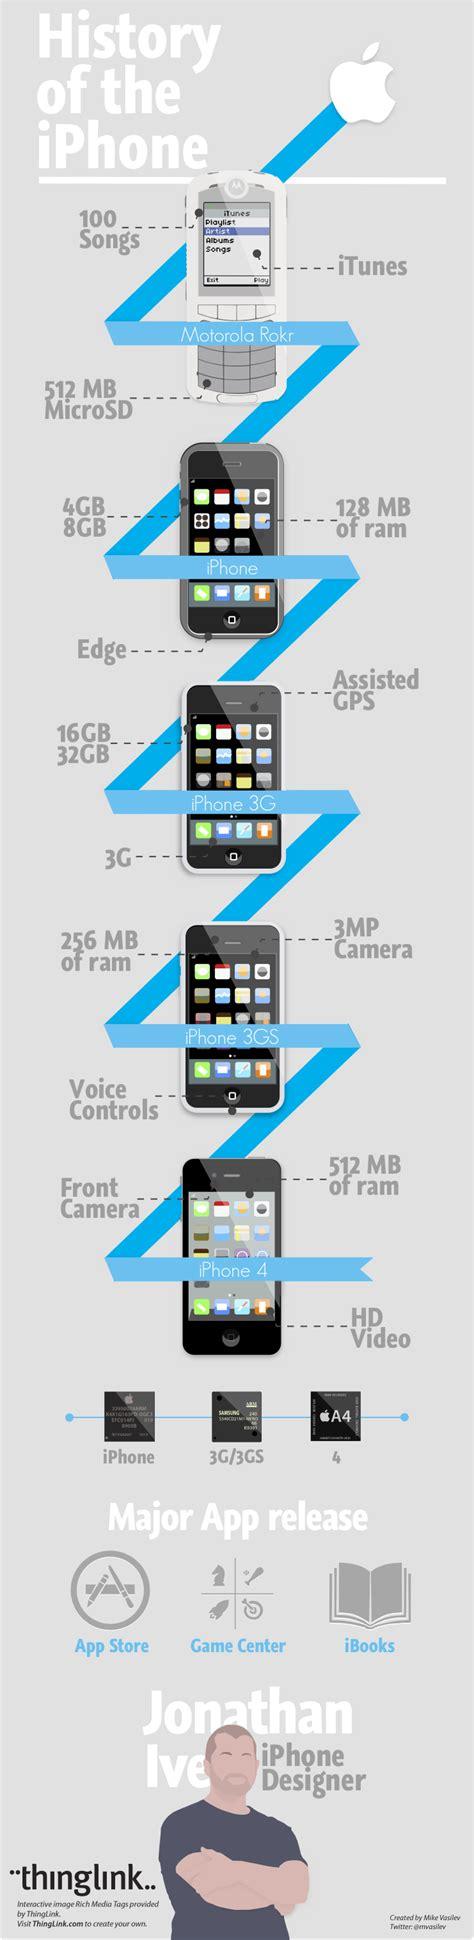 iphone brand history brandingmag